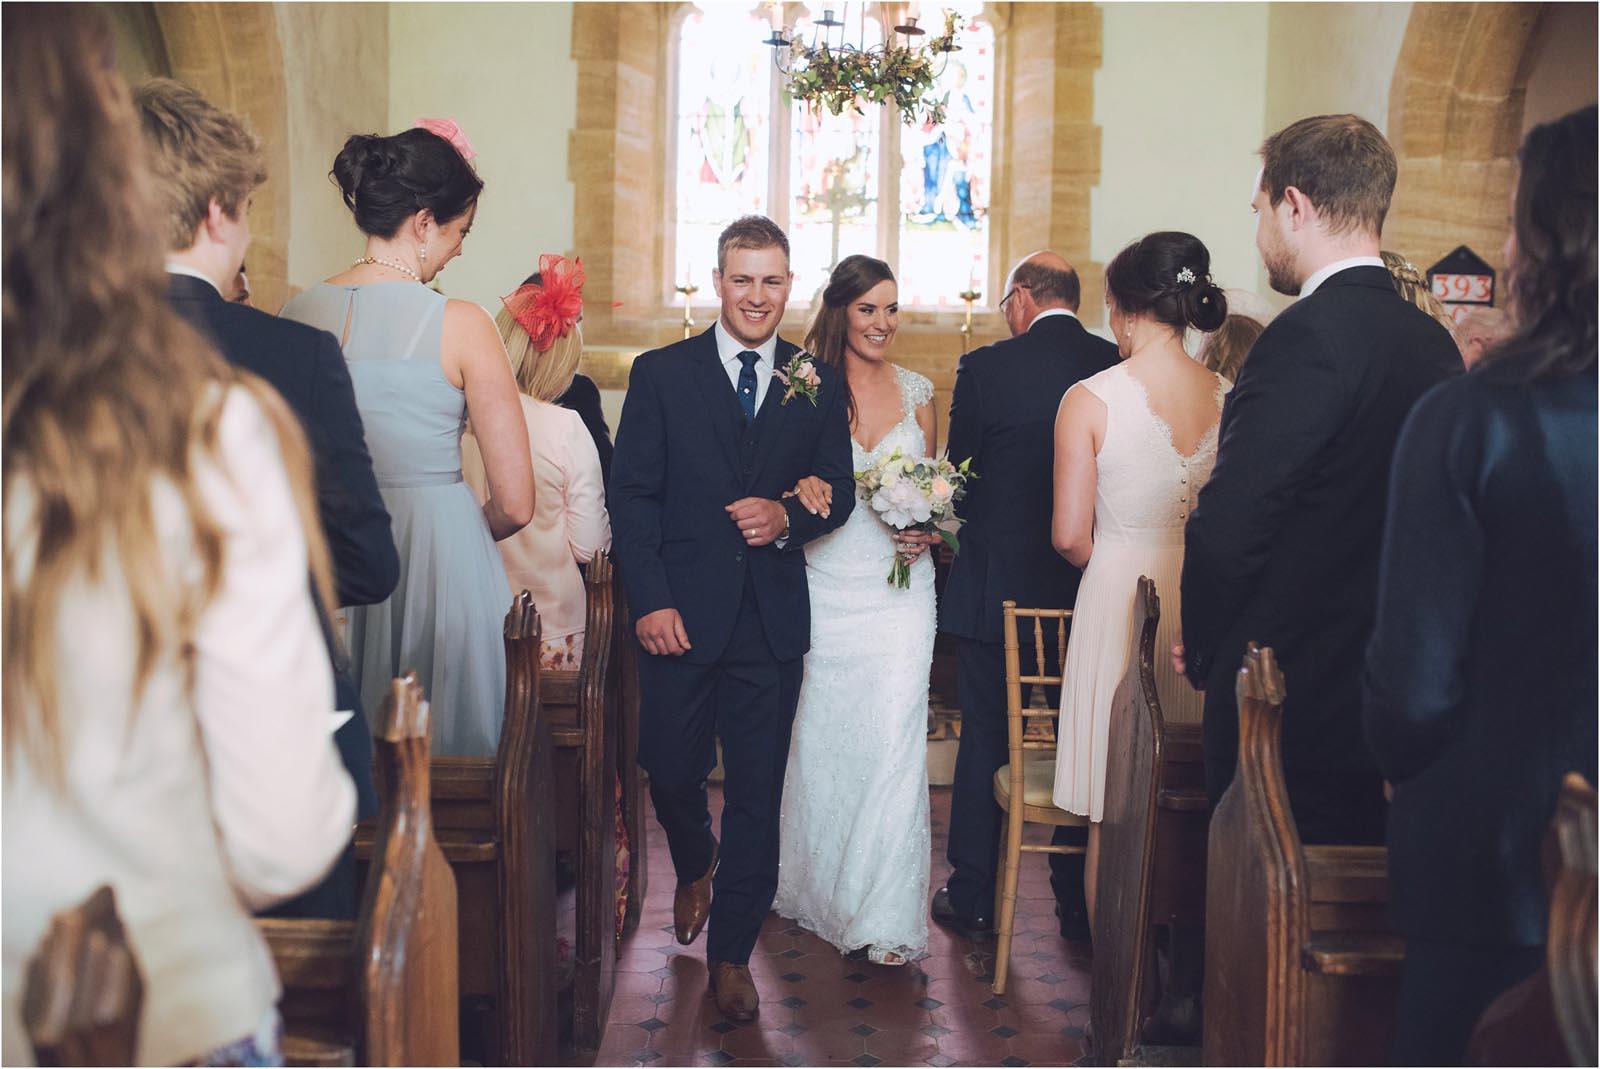 Simon biffen wedding photography 0069